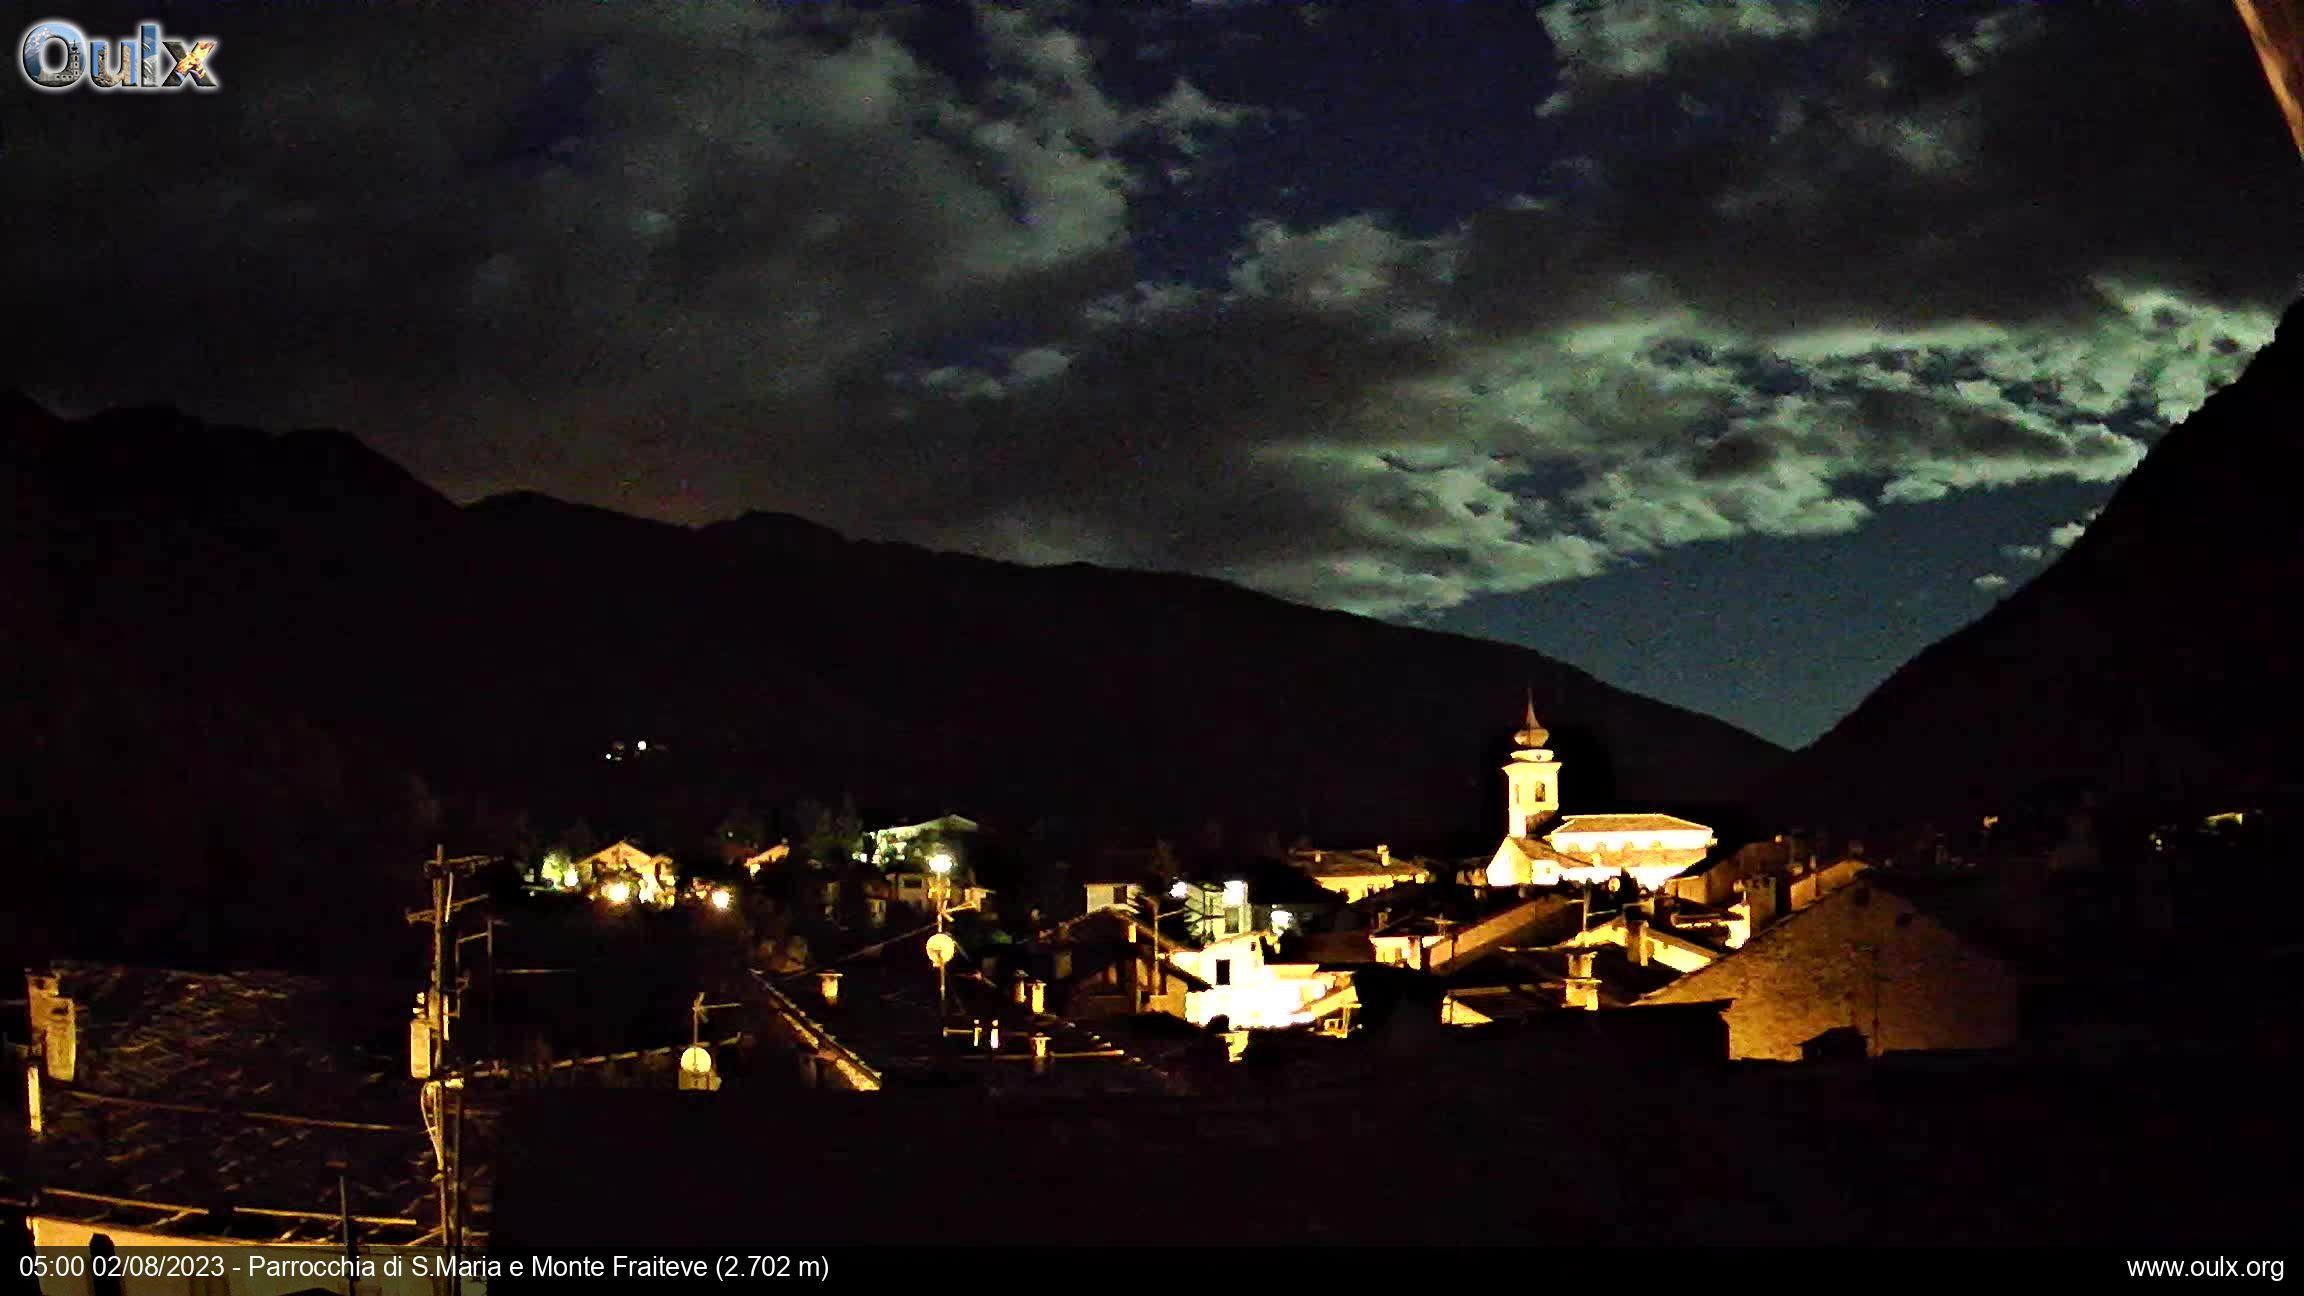 Parrocchia di S.Maria e Monte Fraiteve (2.702 m)